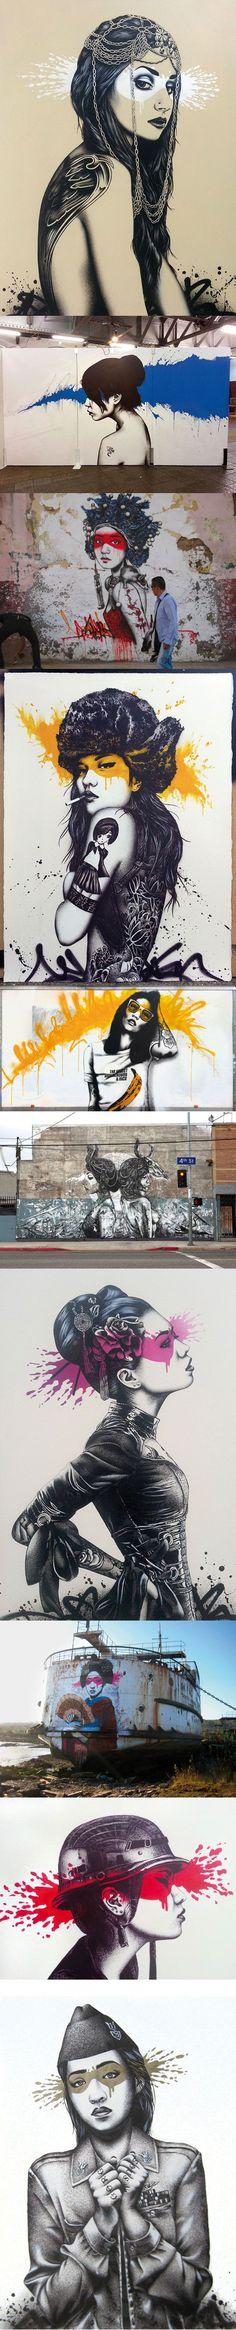 Artist: Findac #streetart jd